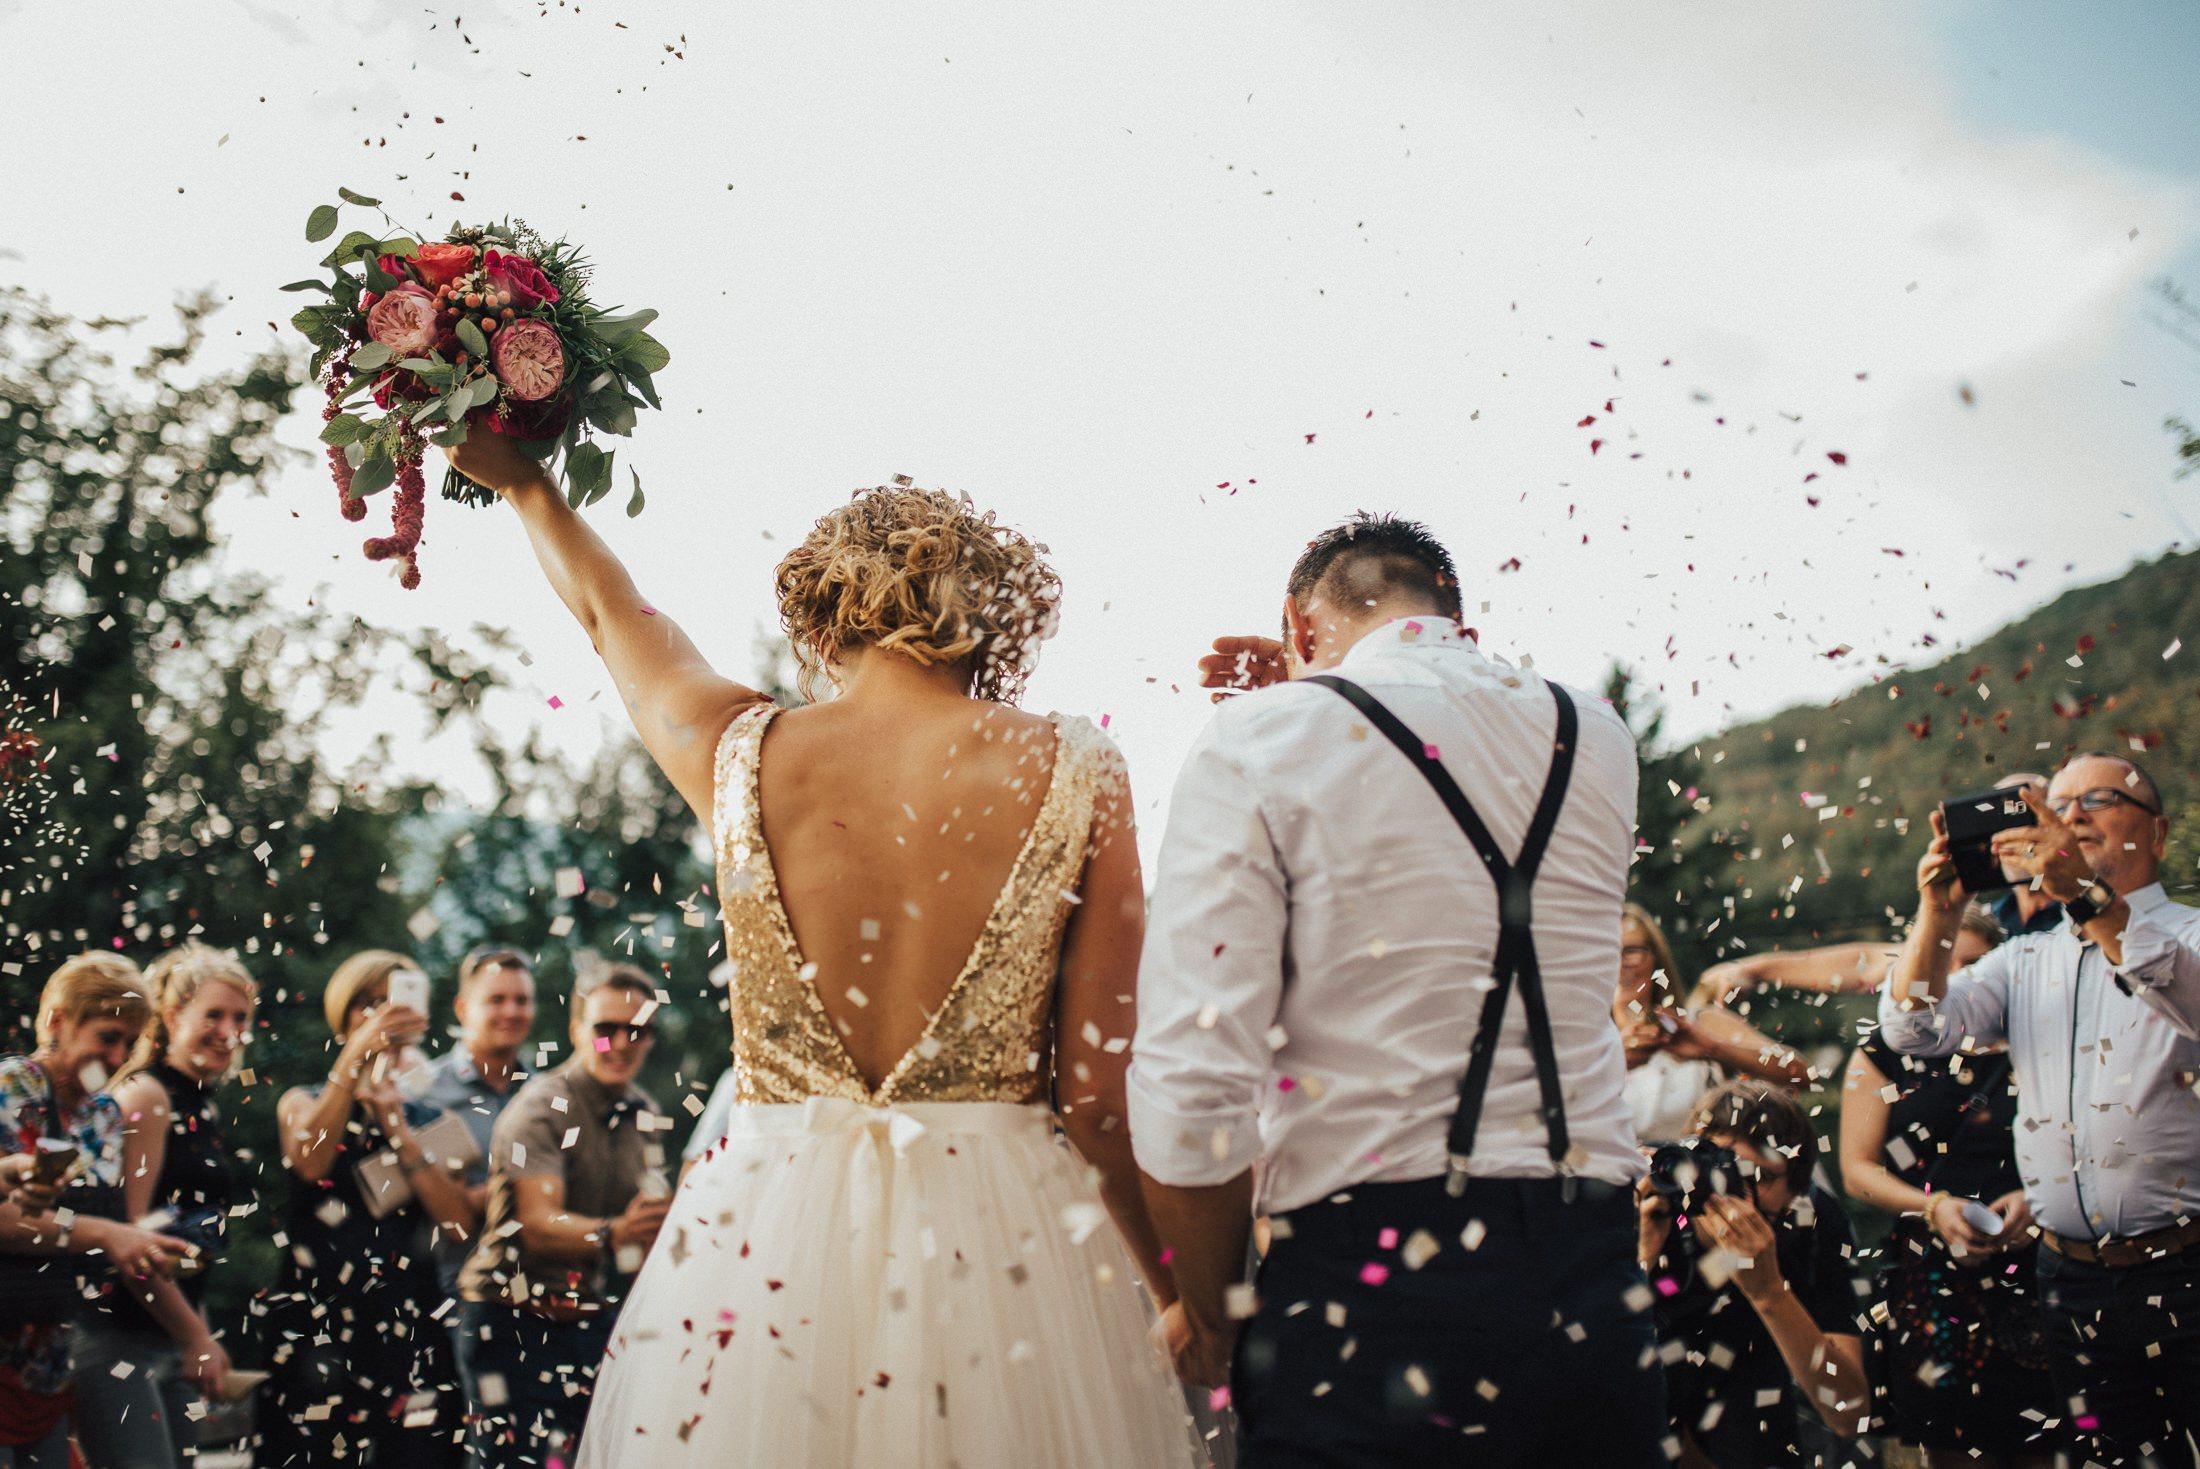 Maried-couple-wedding-season